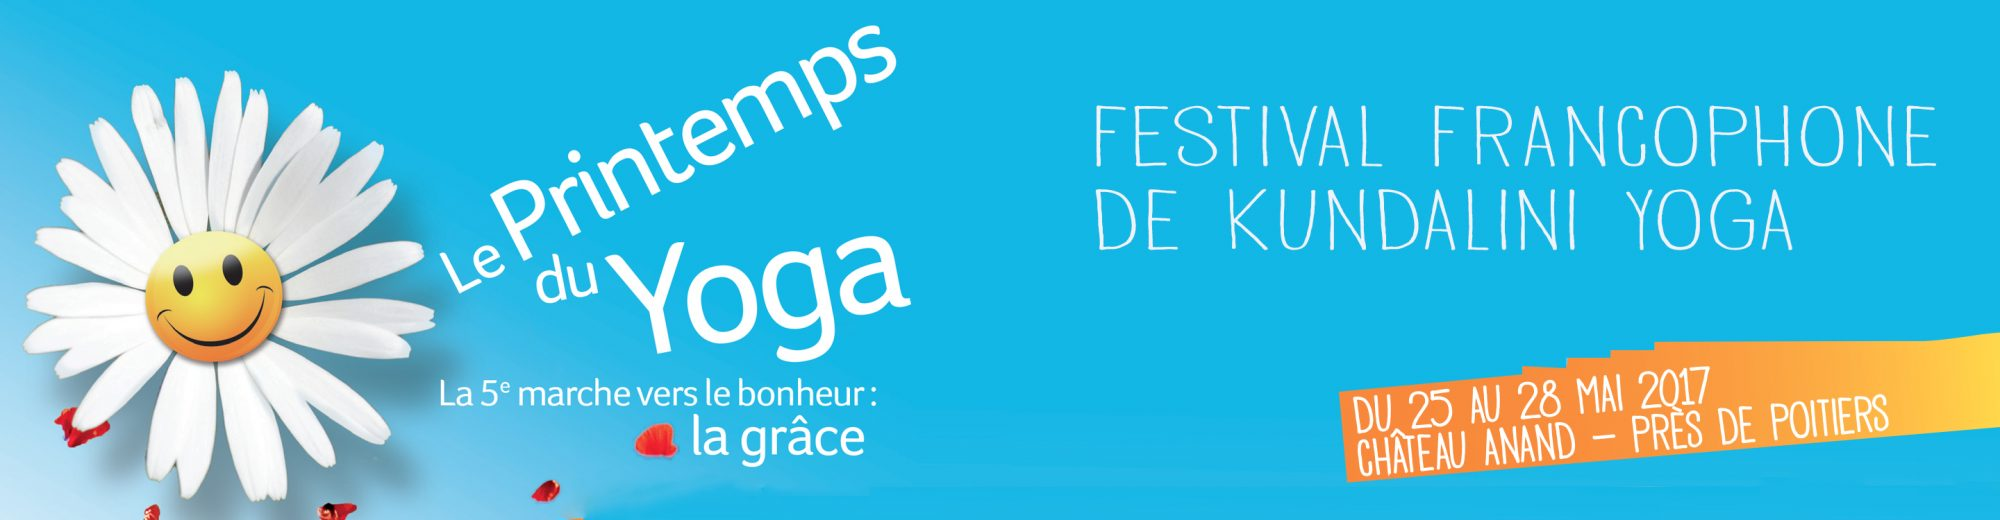 Printemps du Yoga – Festival de Kundalini Yoga